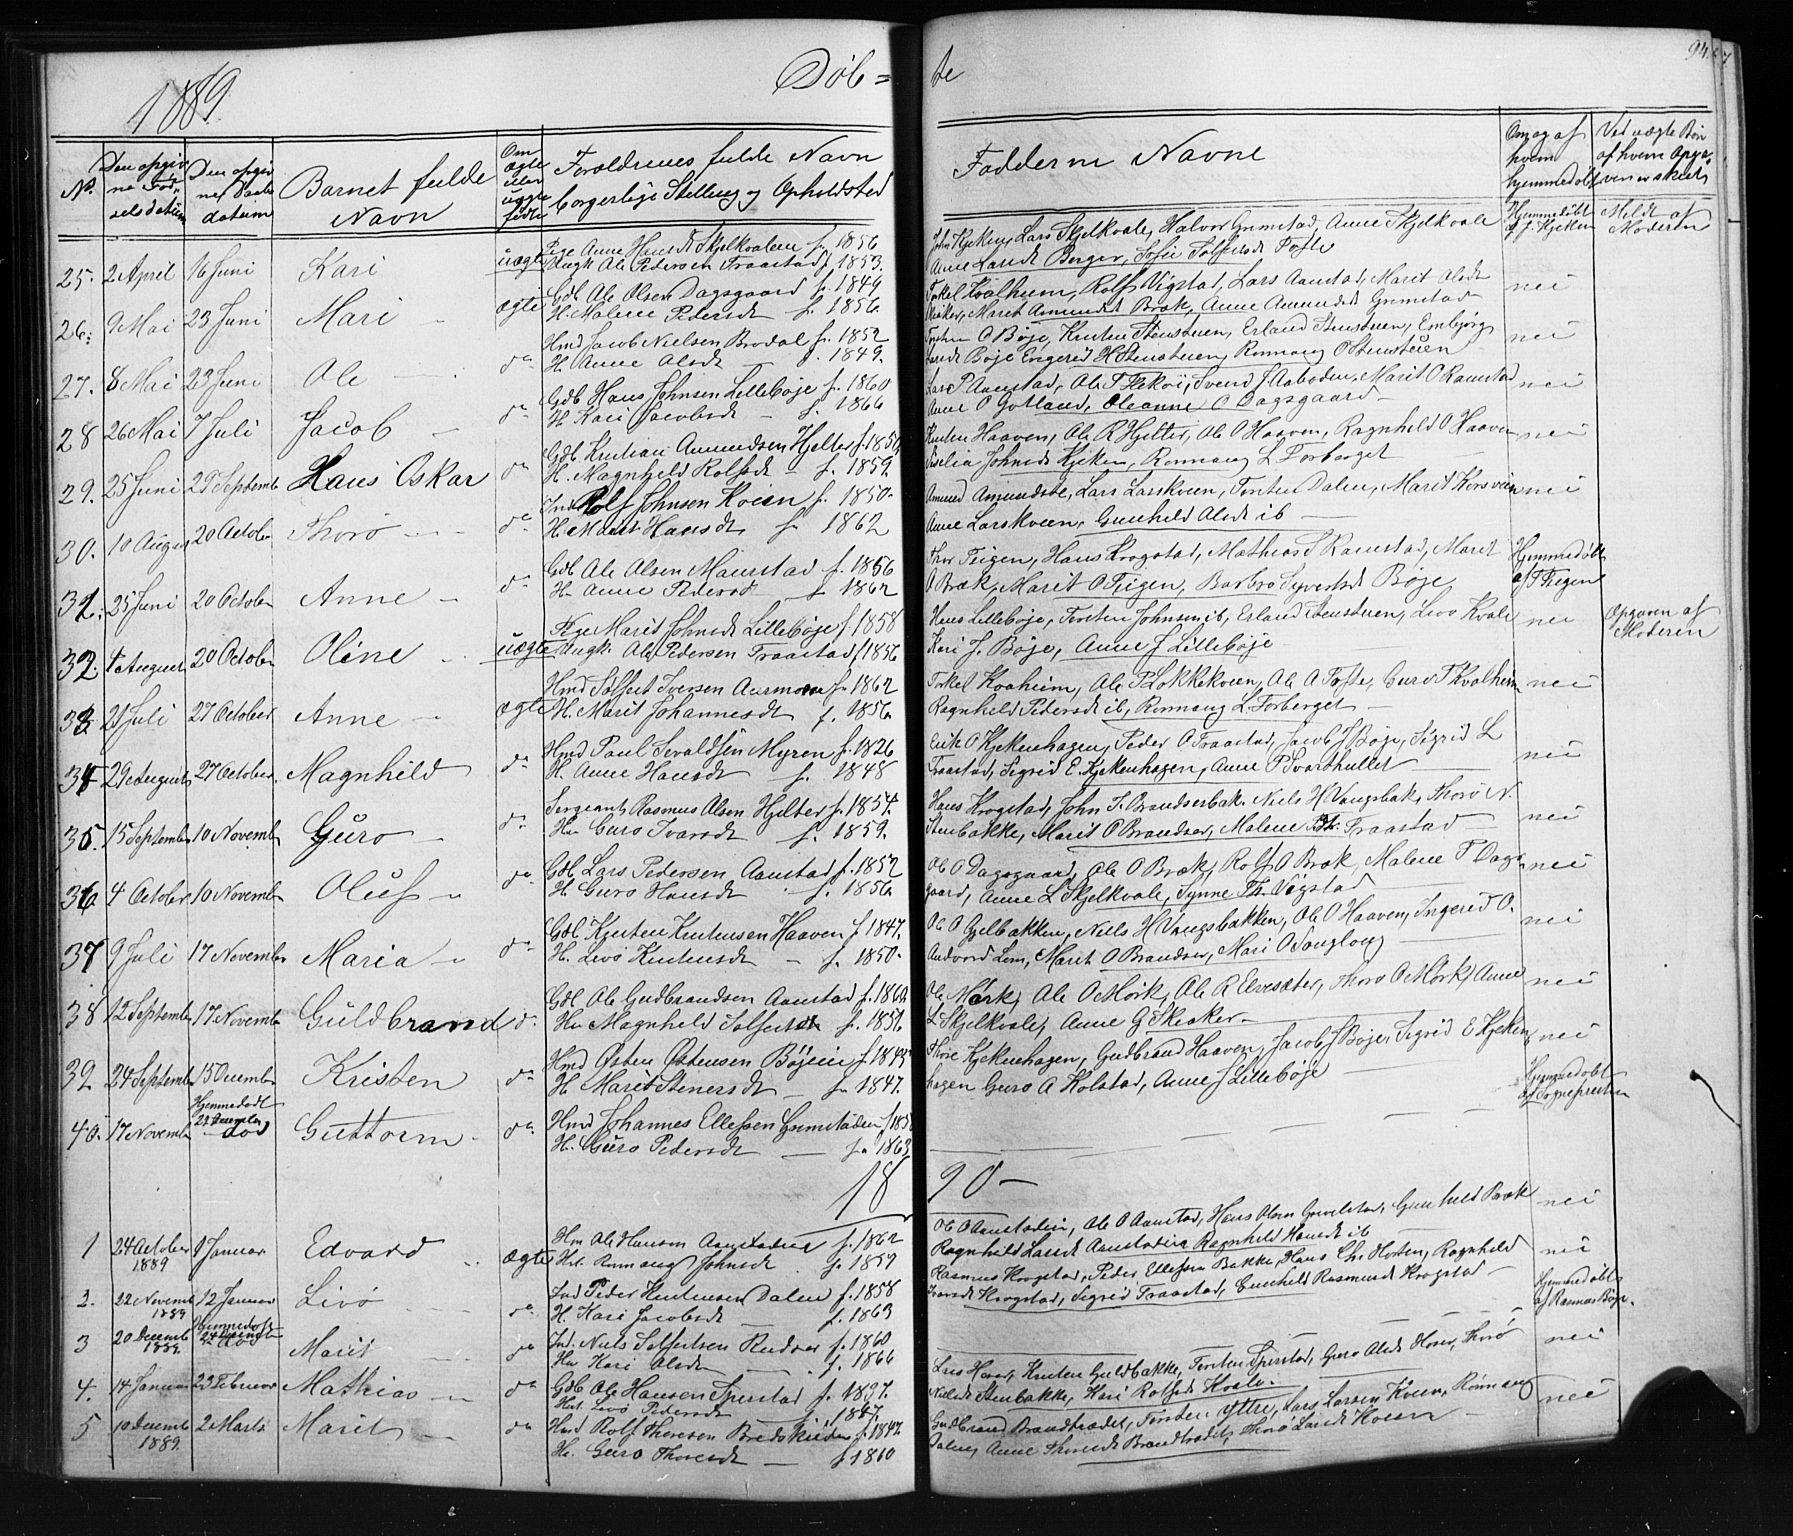 SAH, Skjåk prestekontor, Klokkerbok nr. 1, 1865-1893, s. 94